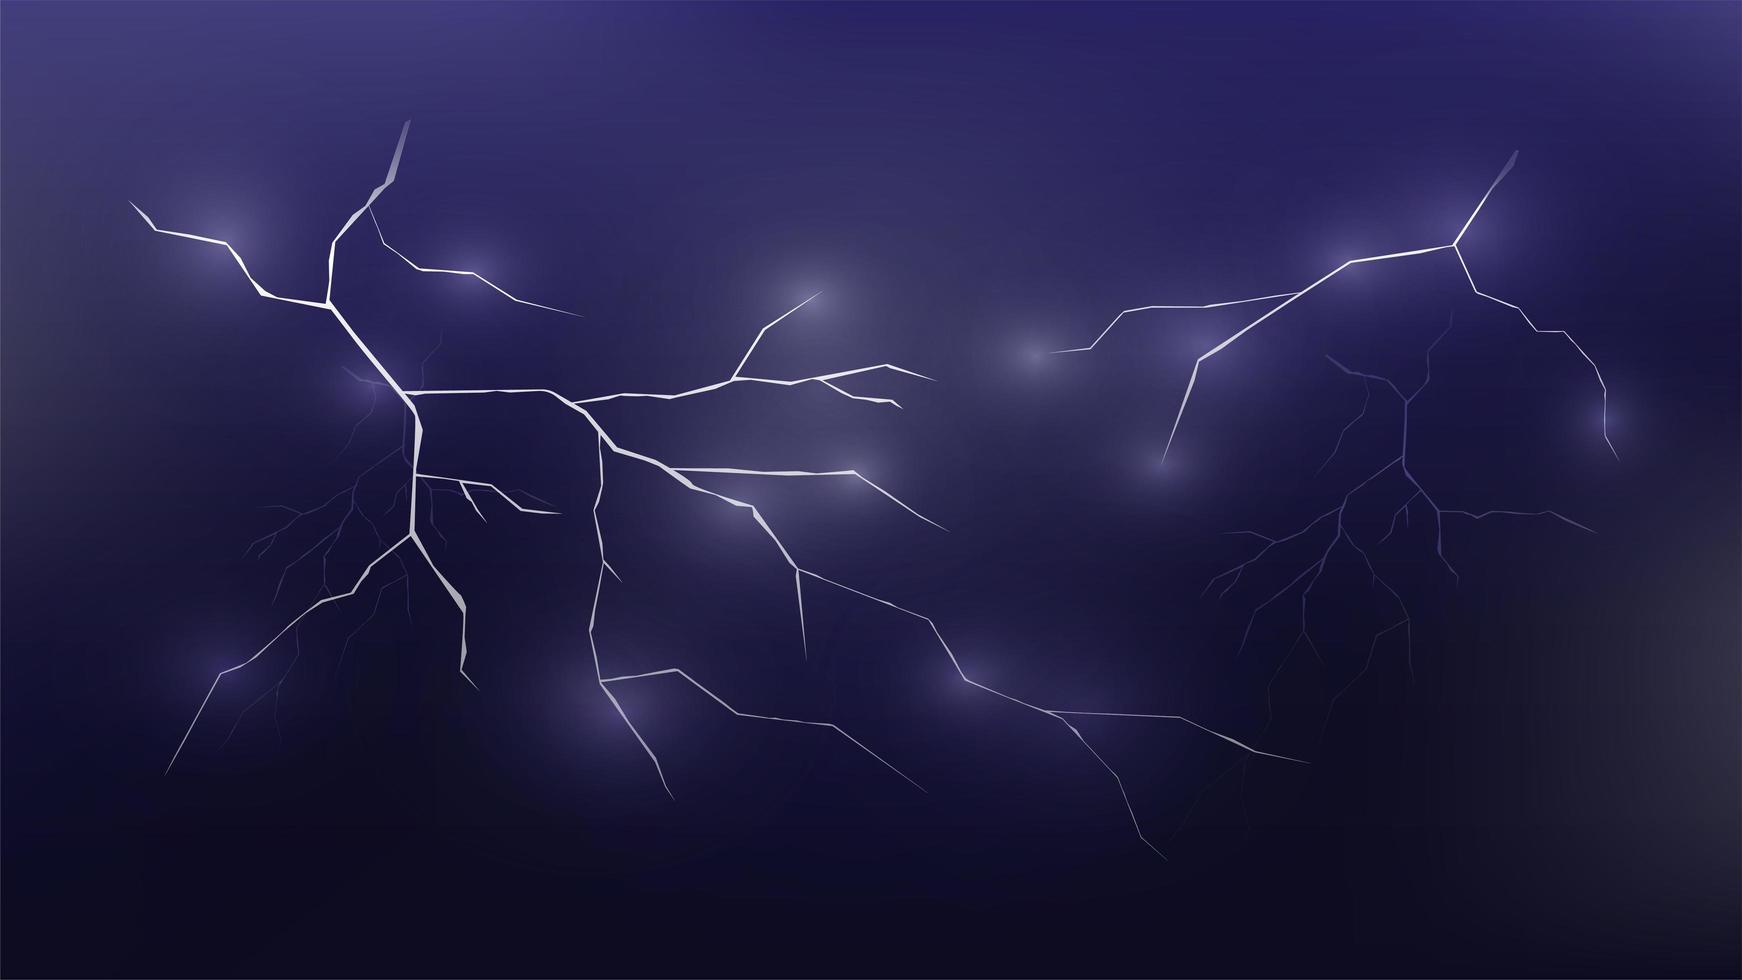 blixt i molnen vektor